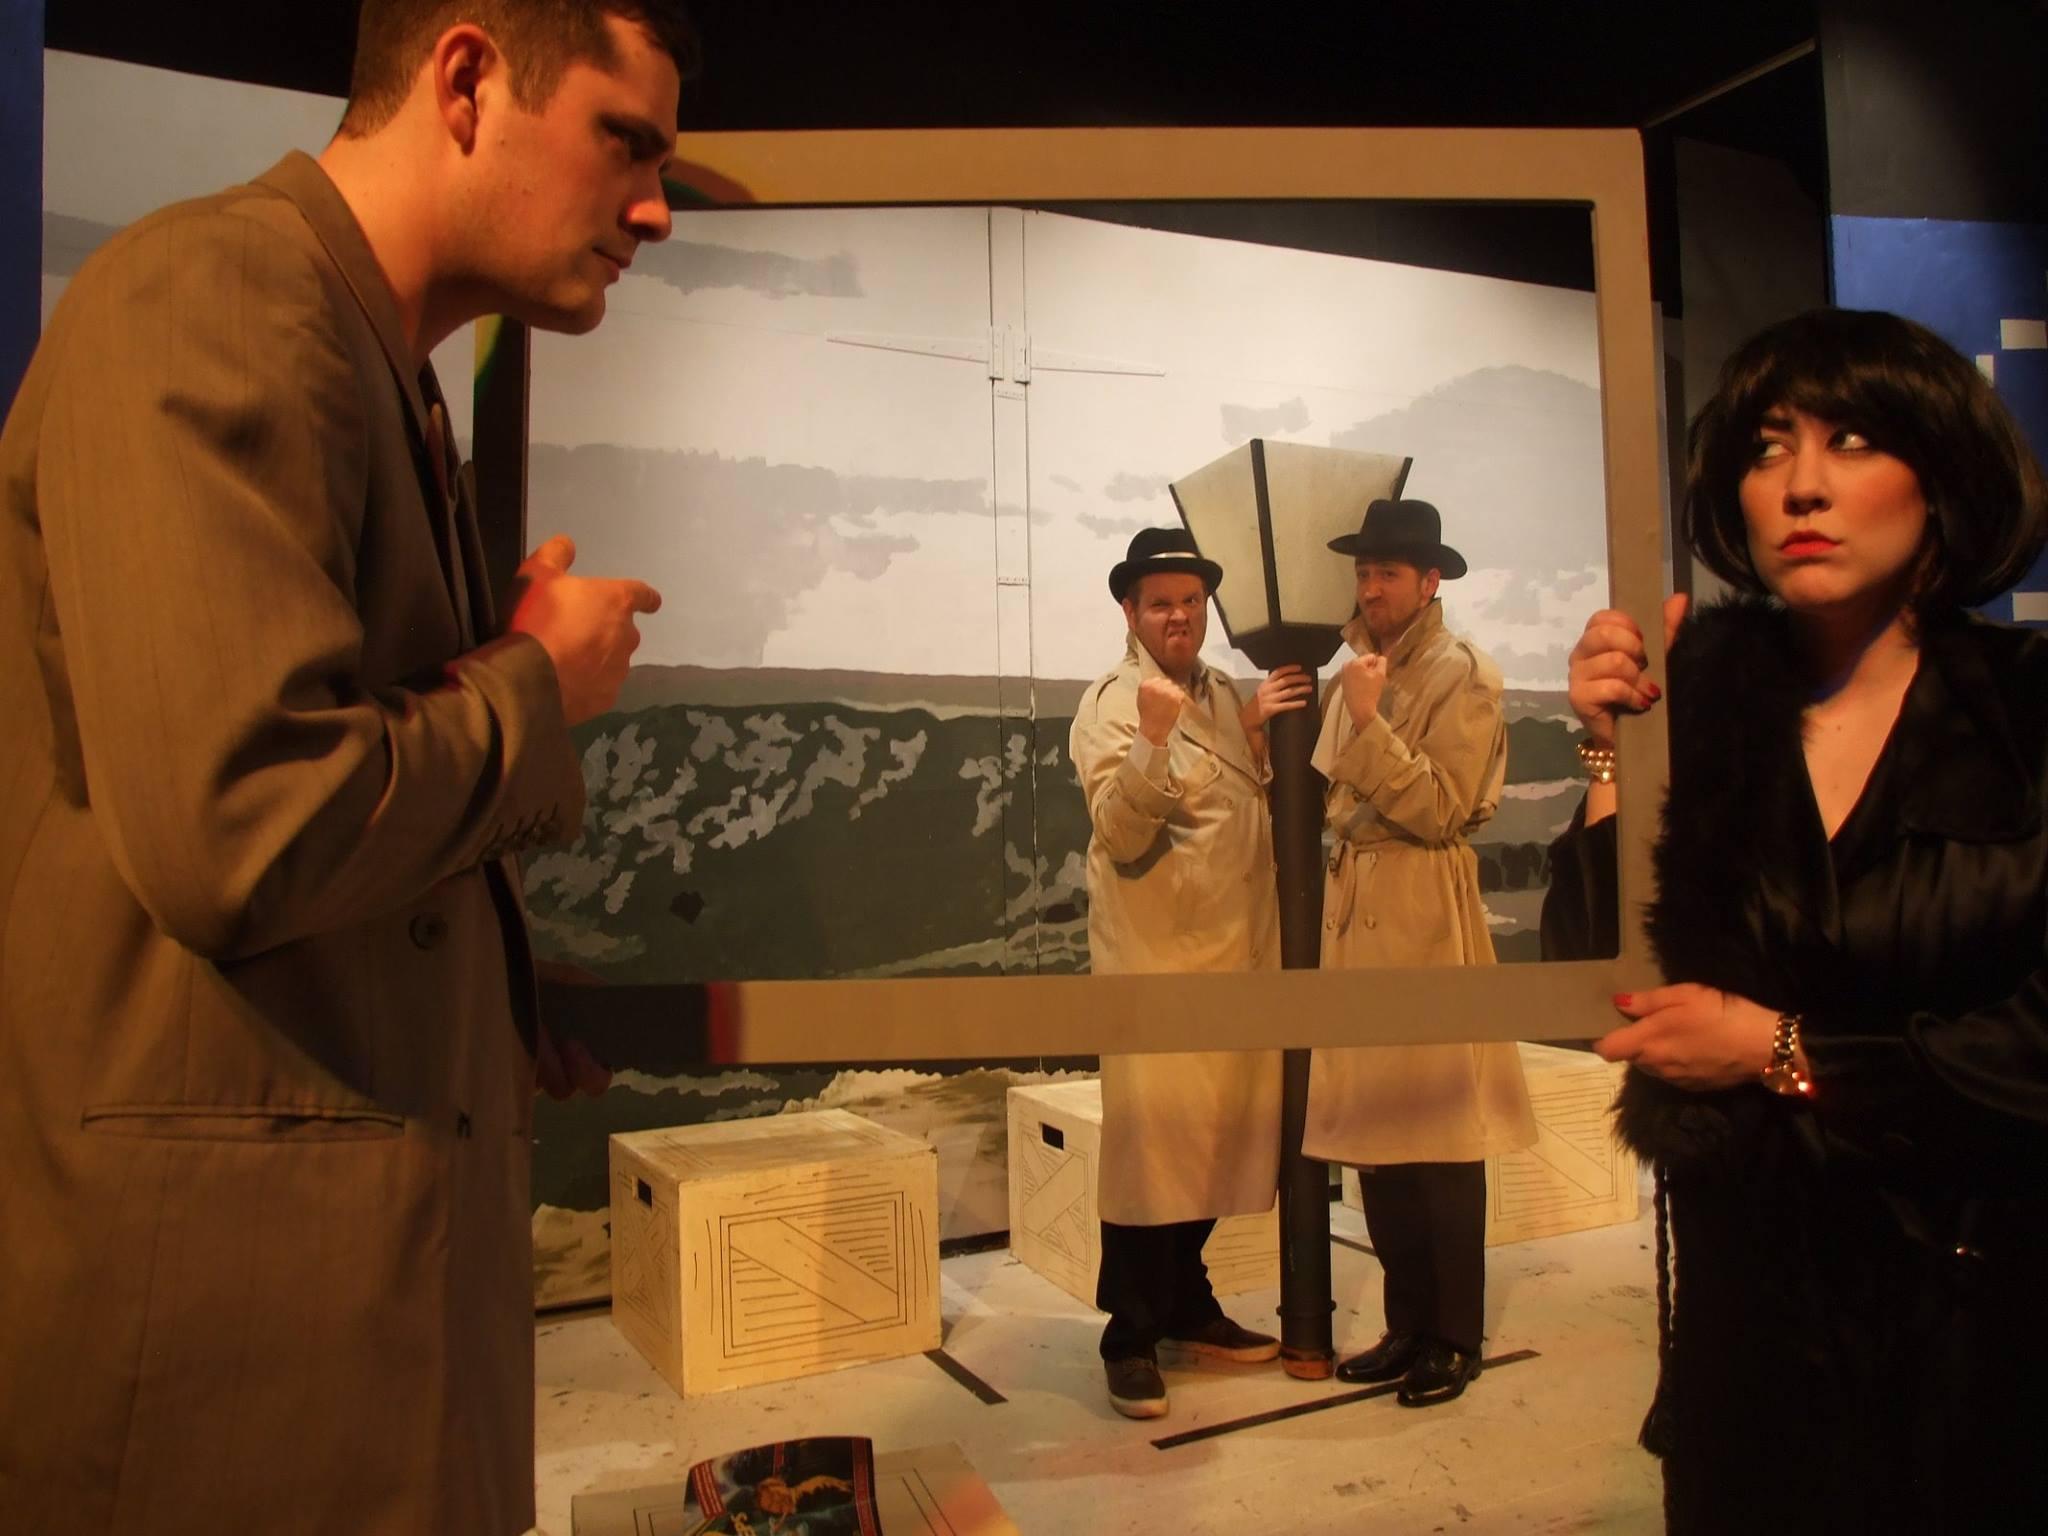 Richard Hannay, Annabella & Spies